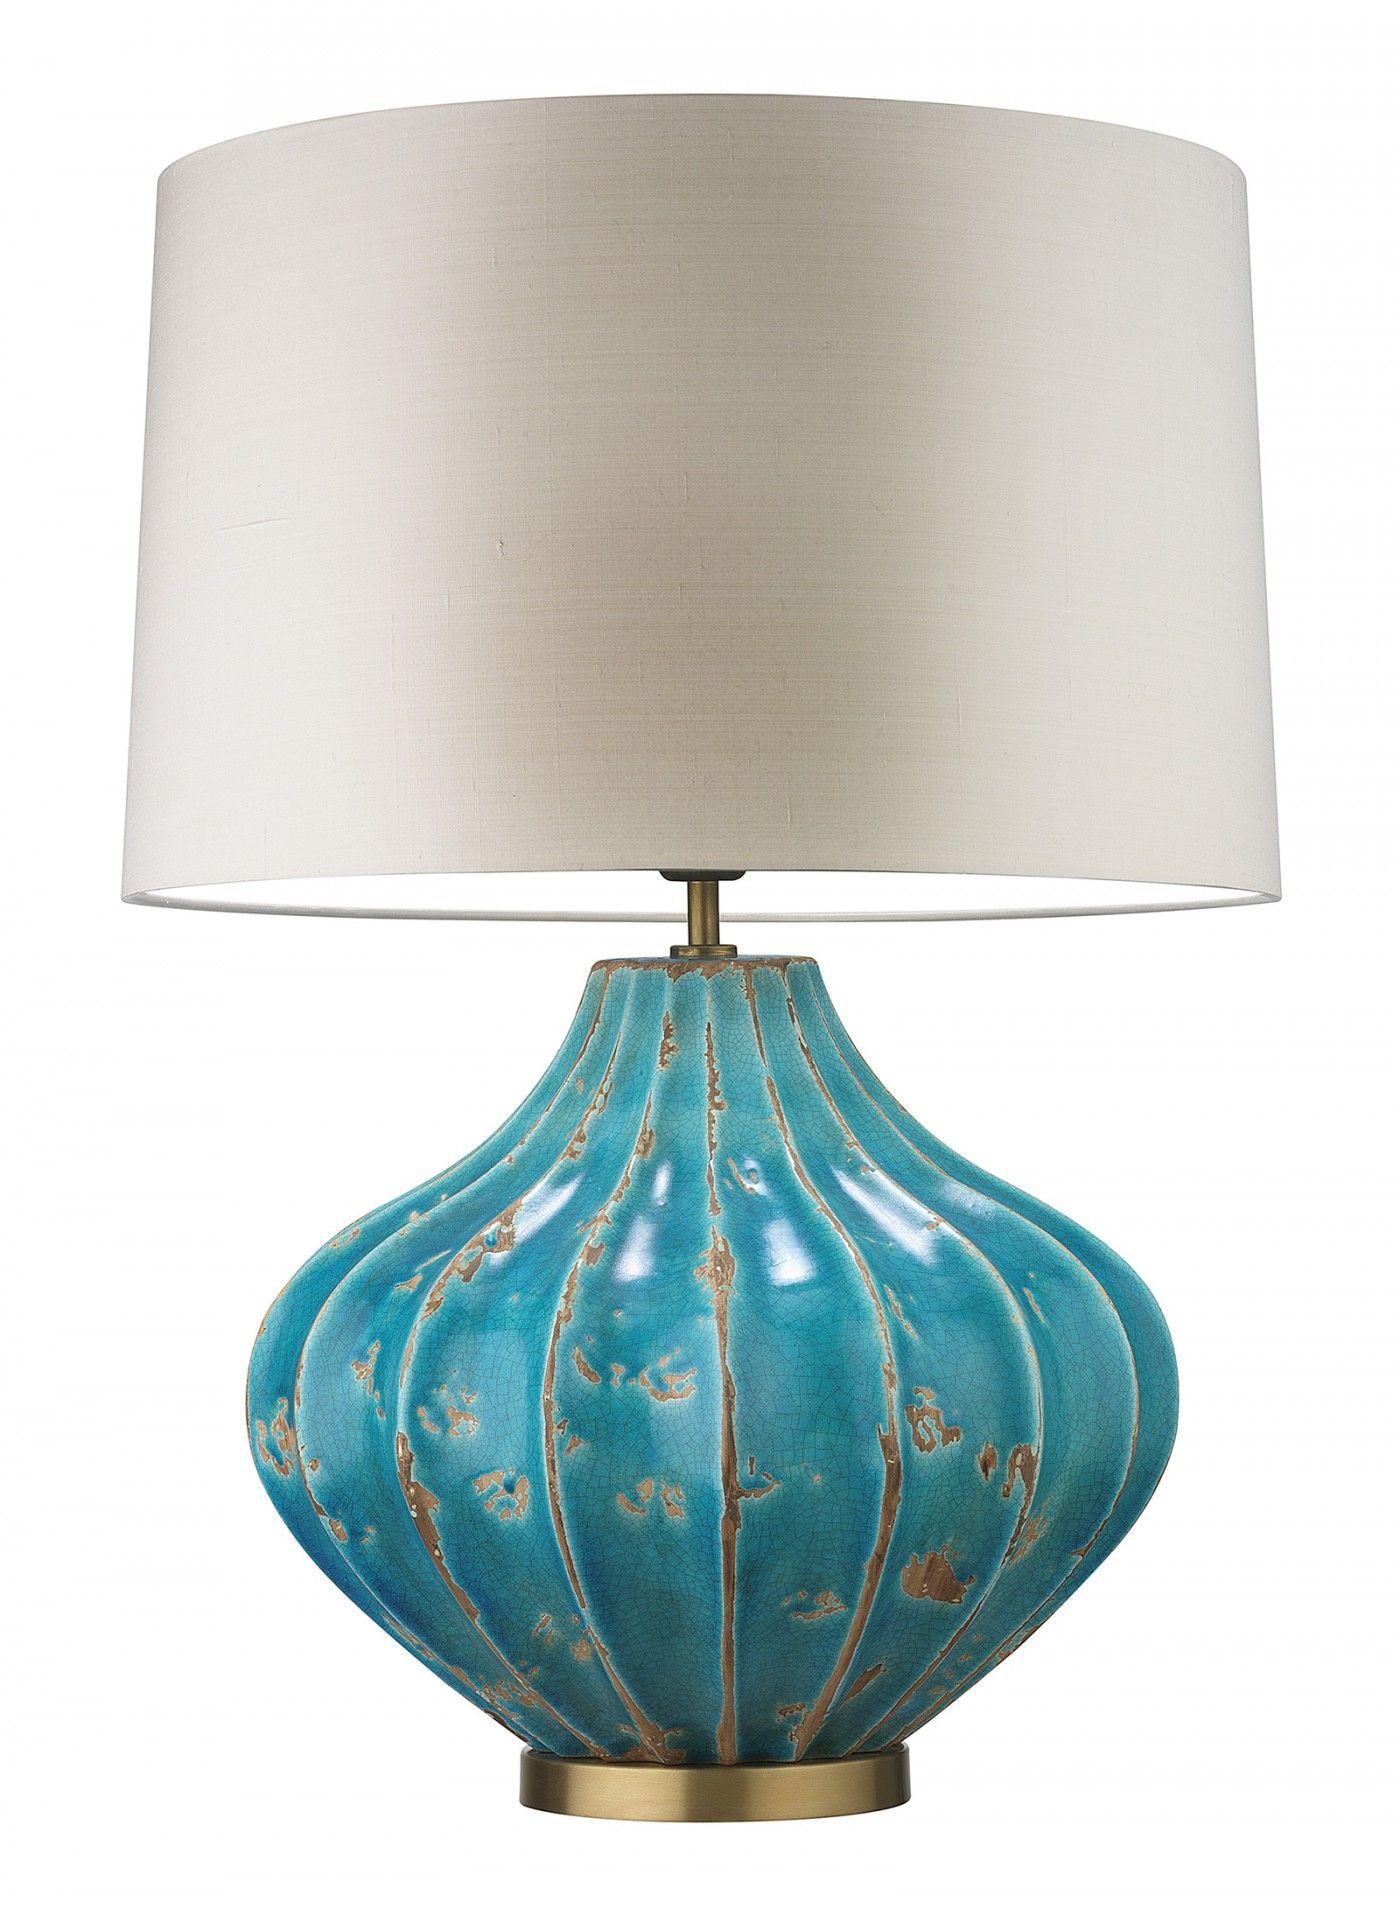 Mallory Turquoise Table Lamp Heathfield Co Lightings Table